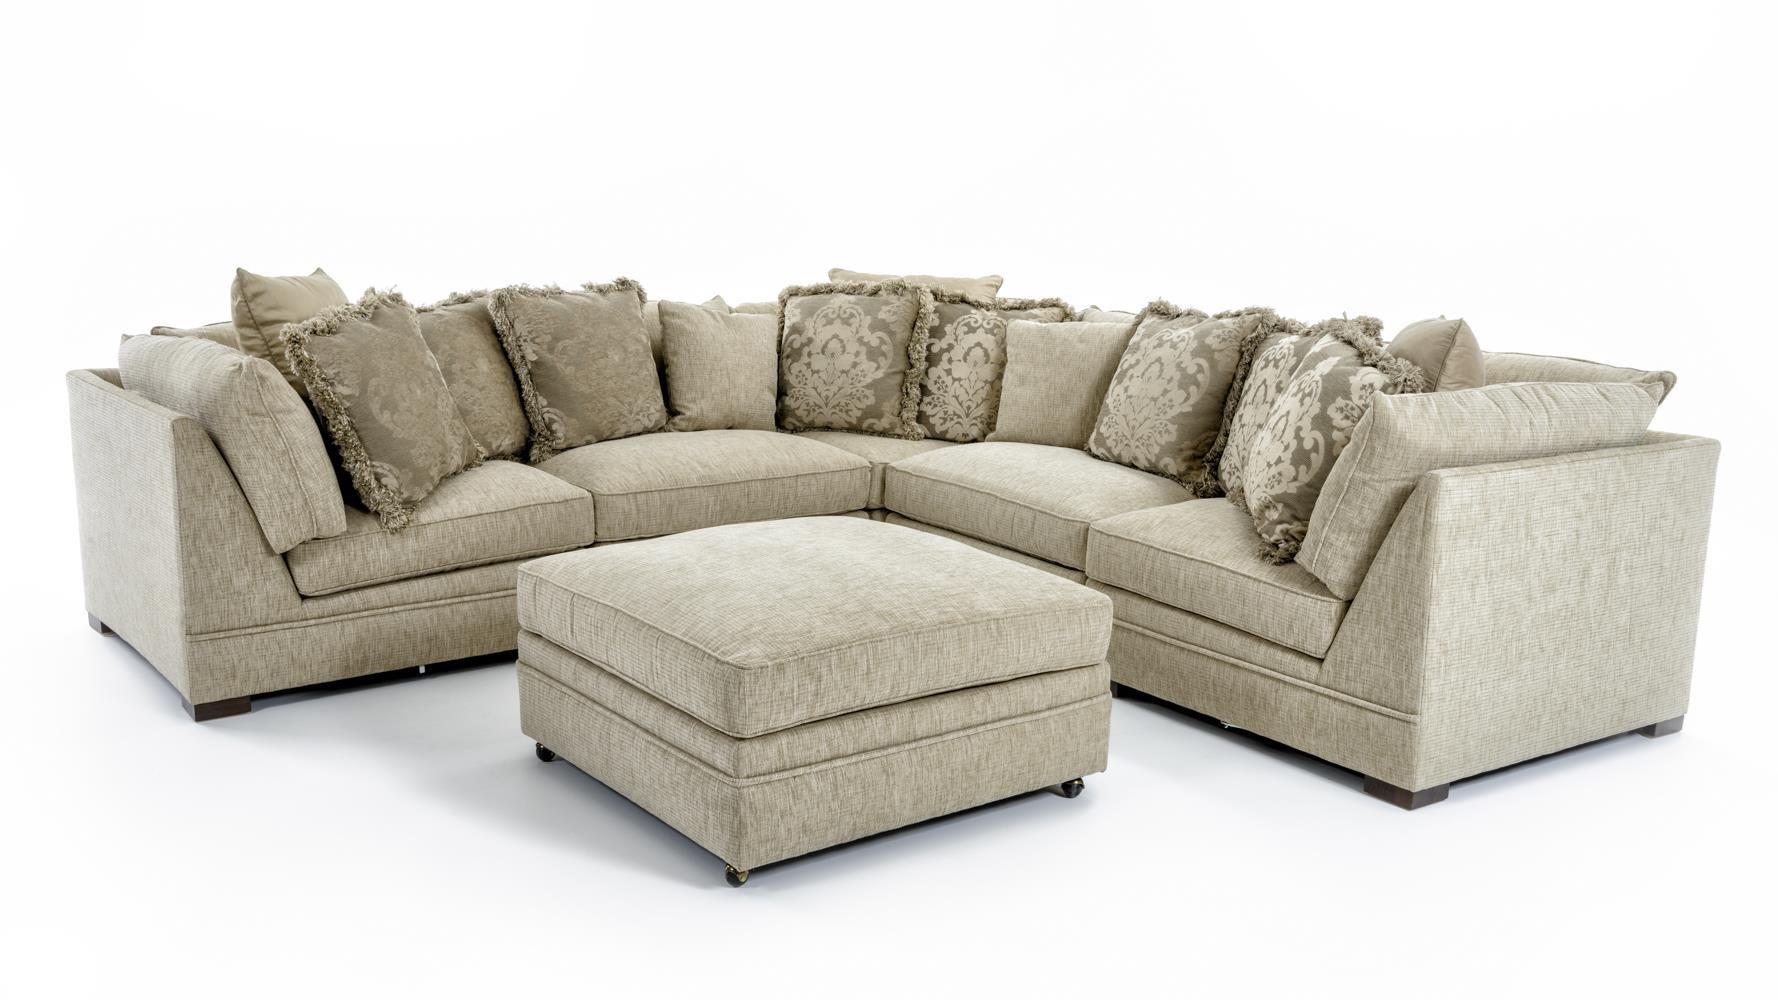 huntington sectional sofa fabric bed argos house 7100 4x7100 51 437100 31 five piece corner